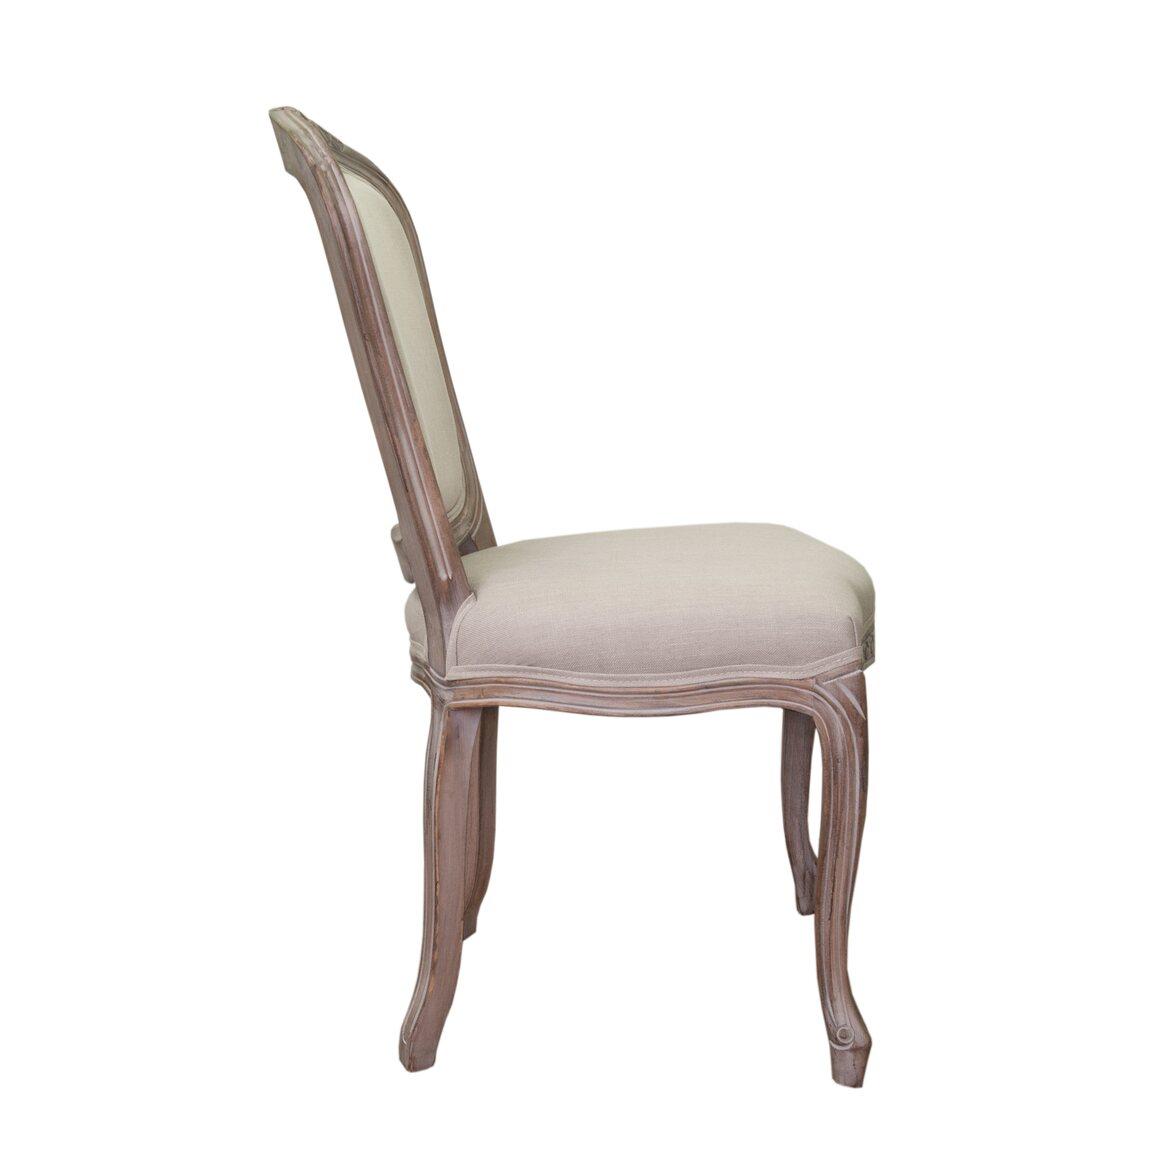 Стул Gran beige 2 | Обеденные стулья Kingsby